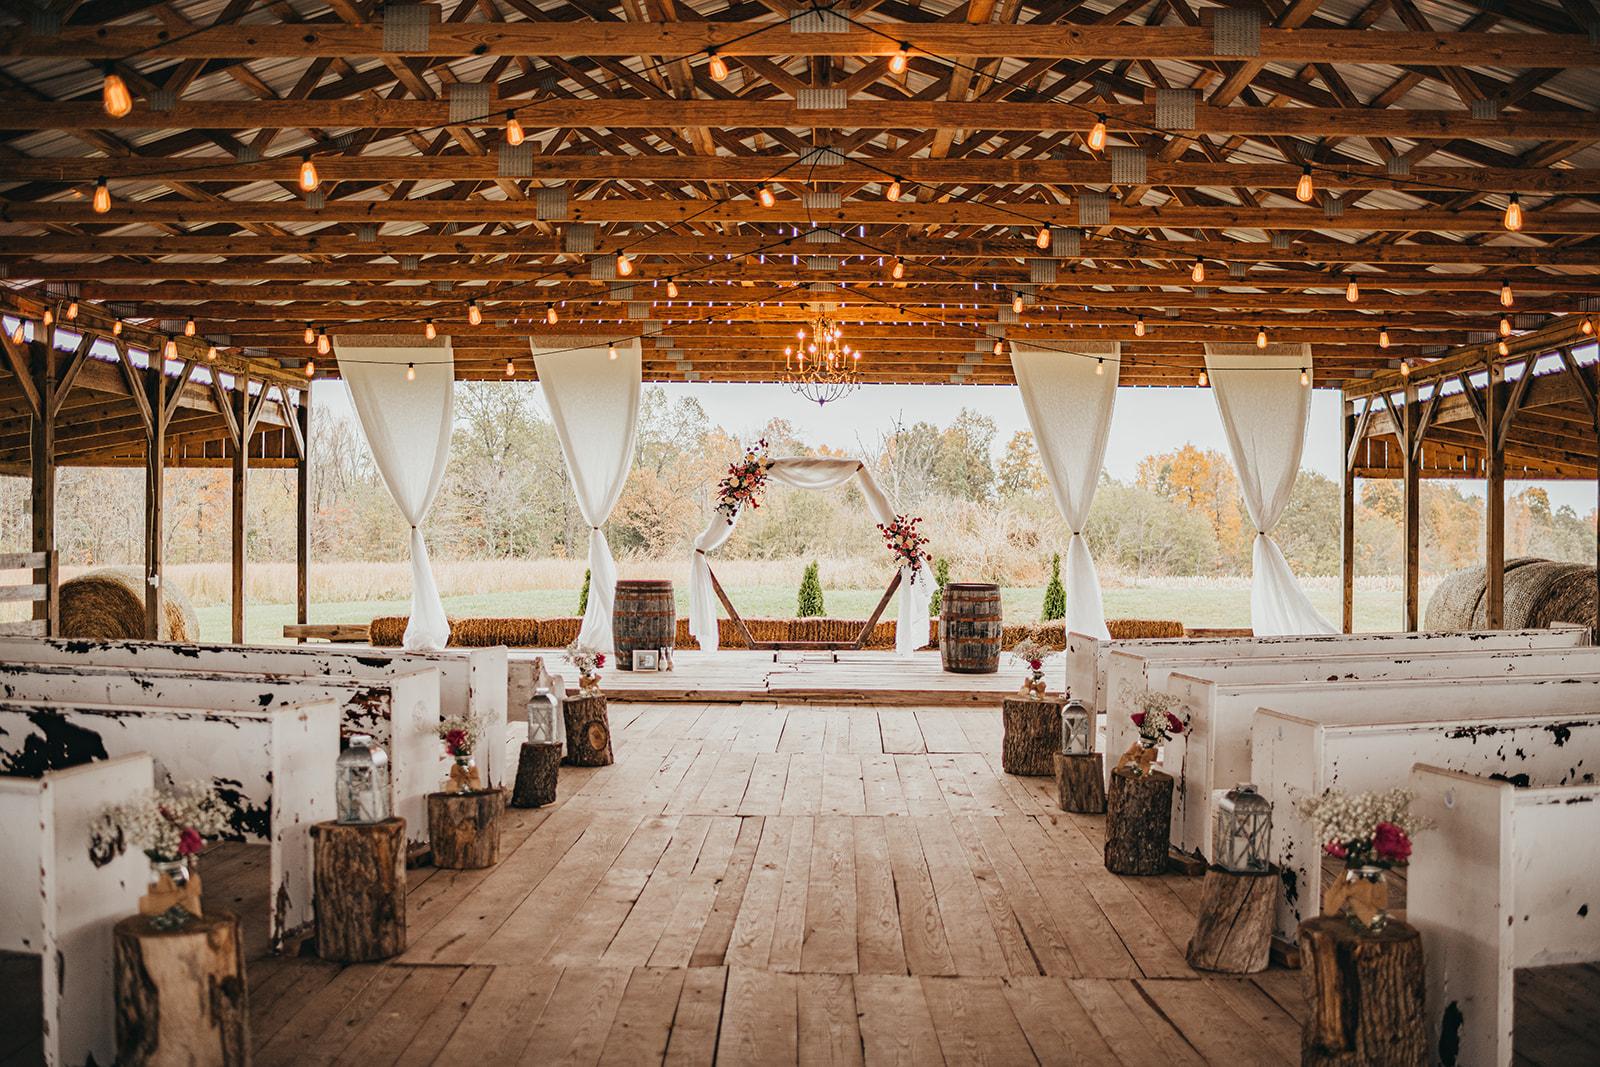 Burdoc Farms wedding ceremony decor